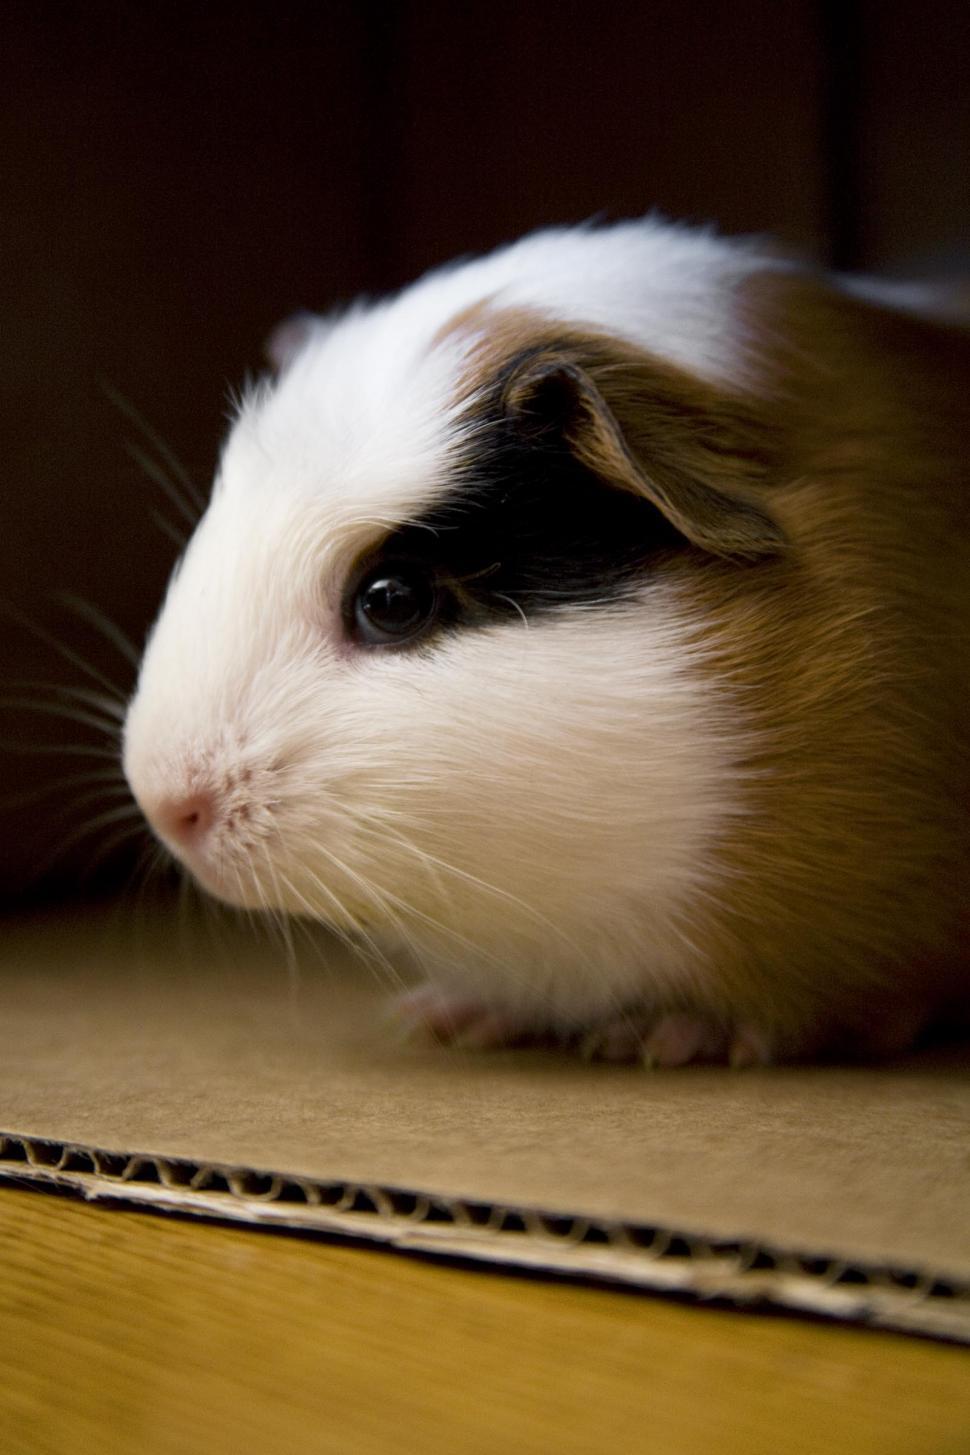 Download Free Stock HD Photo of Guinea Pig peeking from inside cardboard box Online